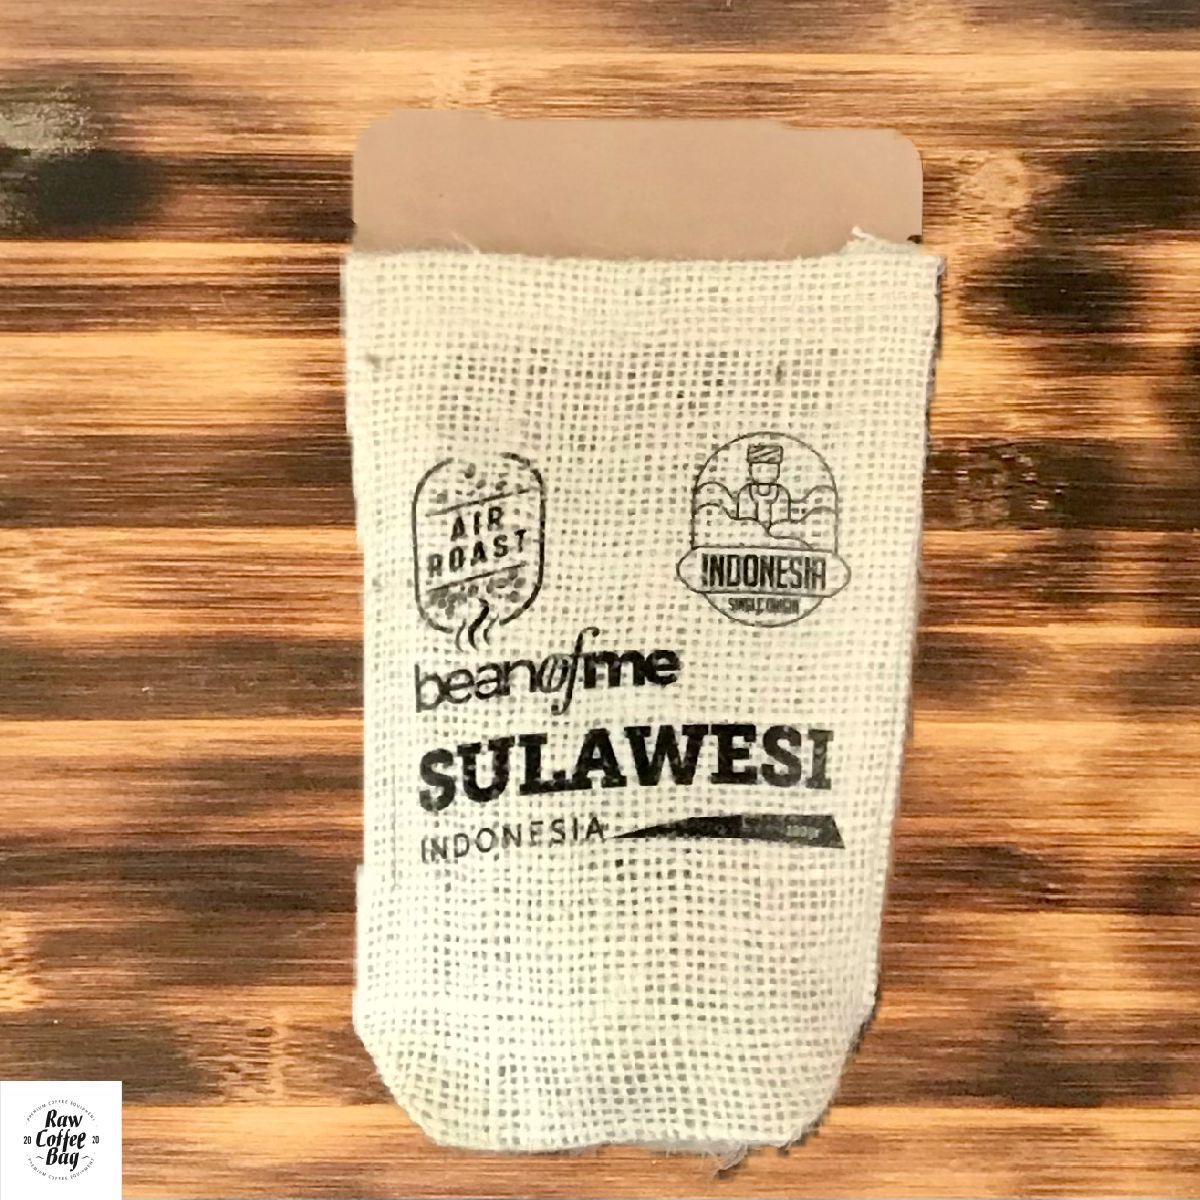 Beanofme Endonezya Selawesi Kahvesi